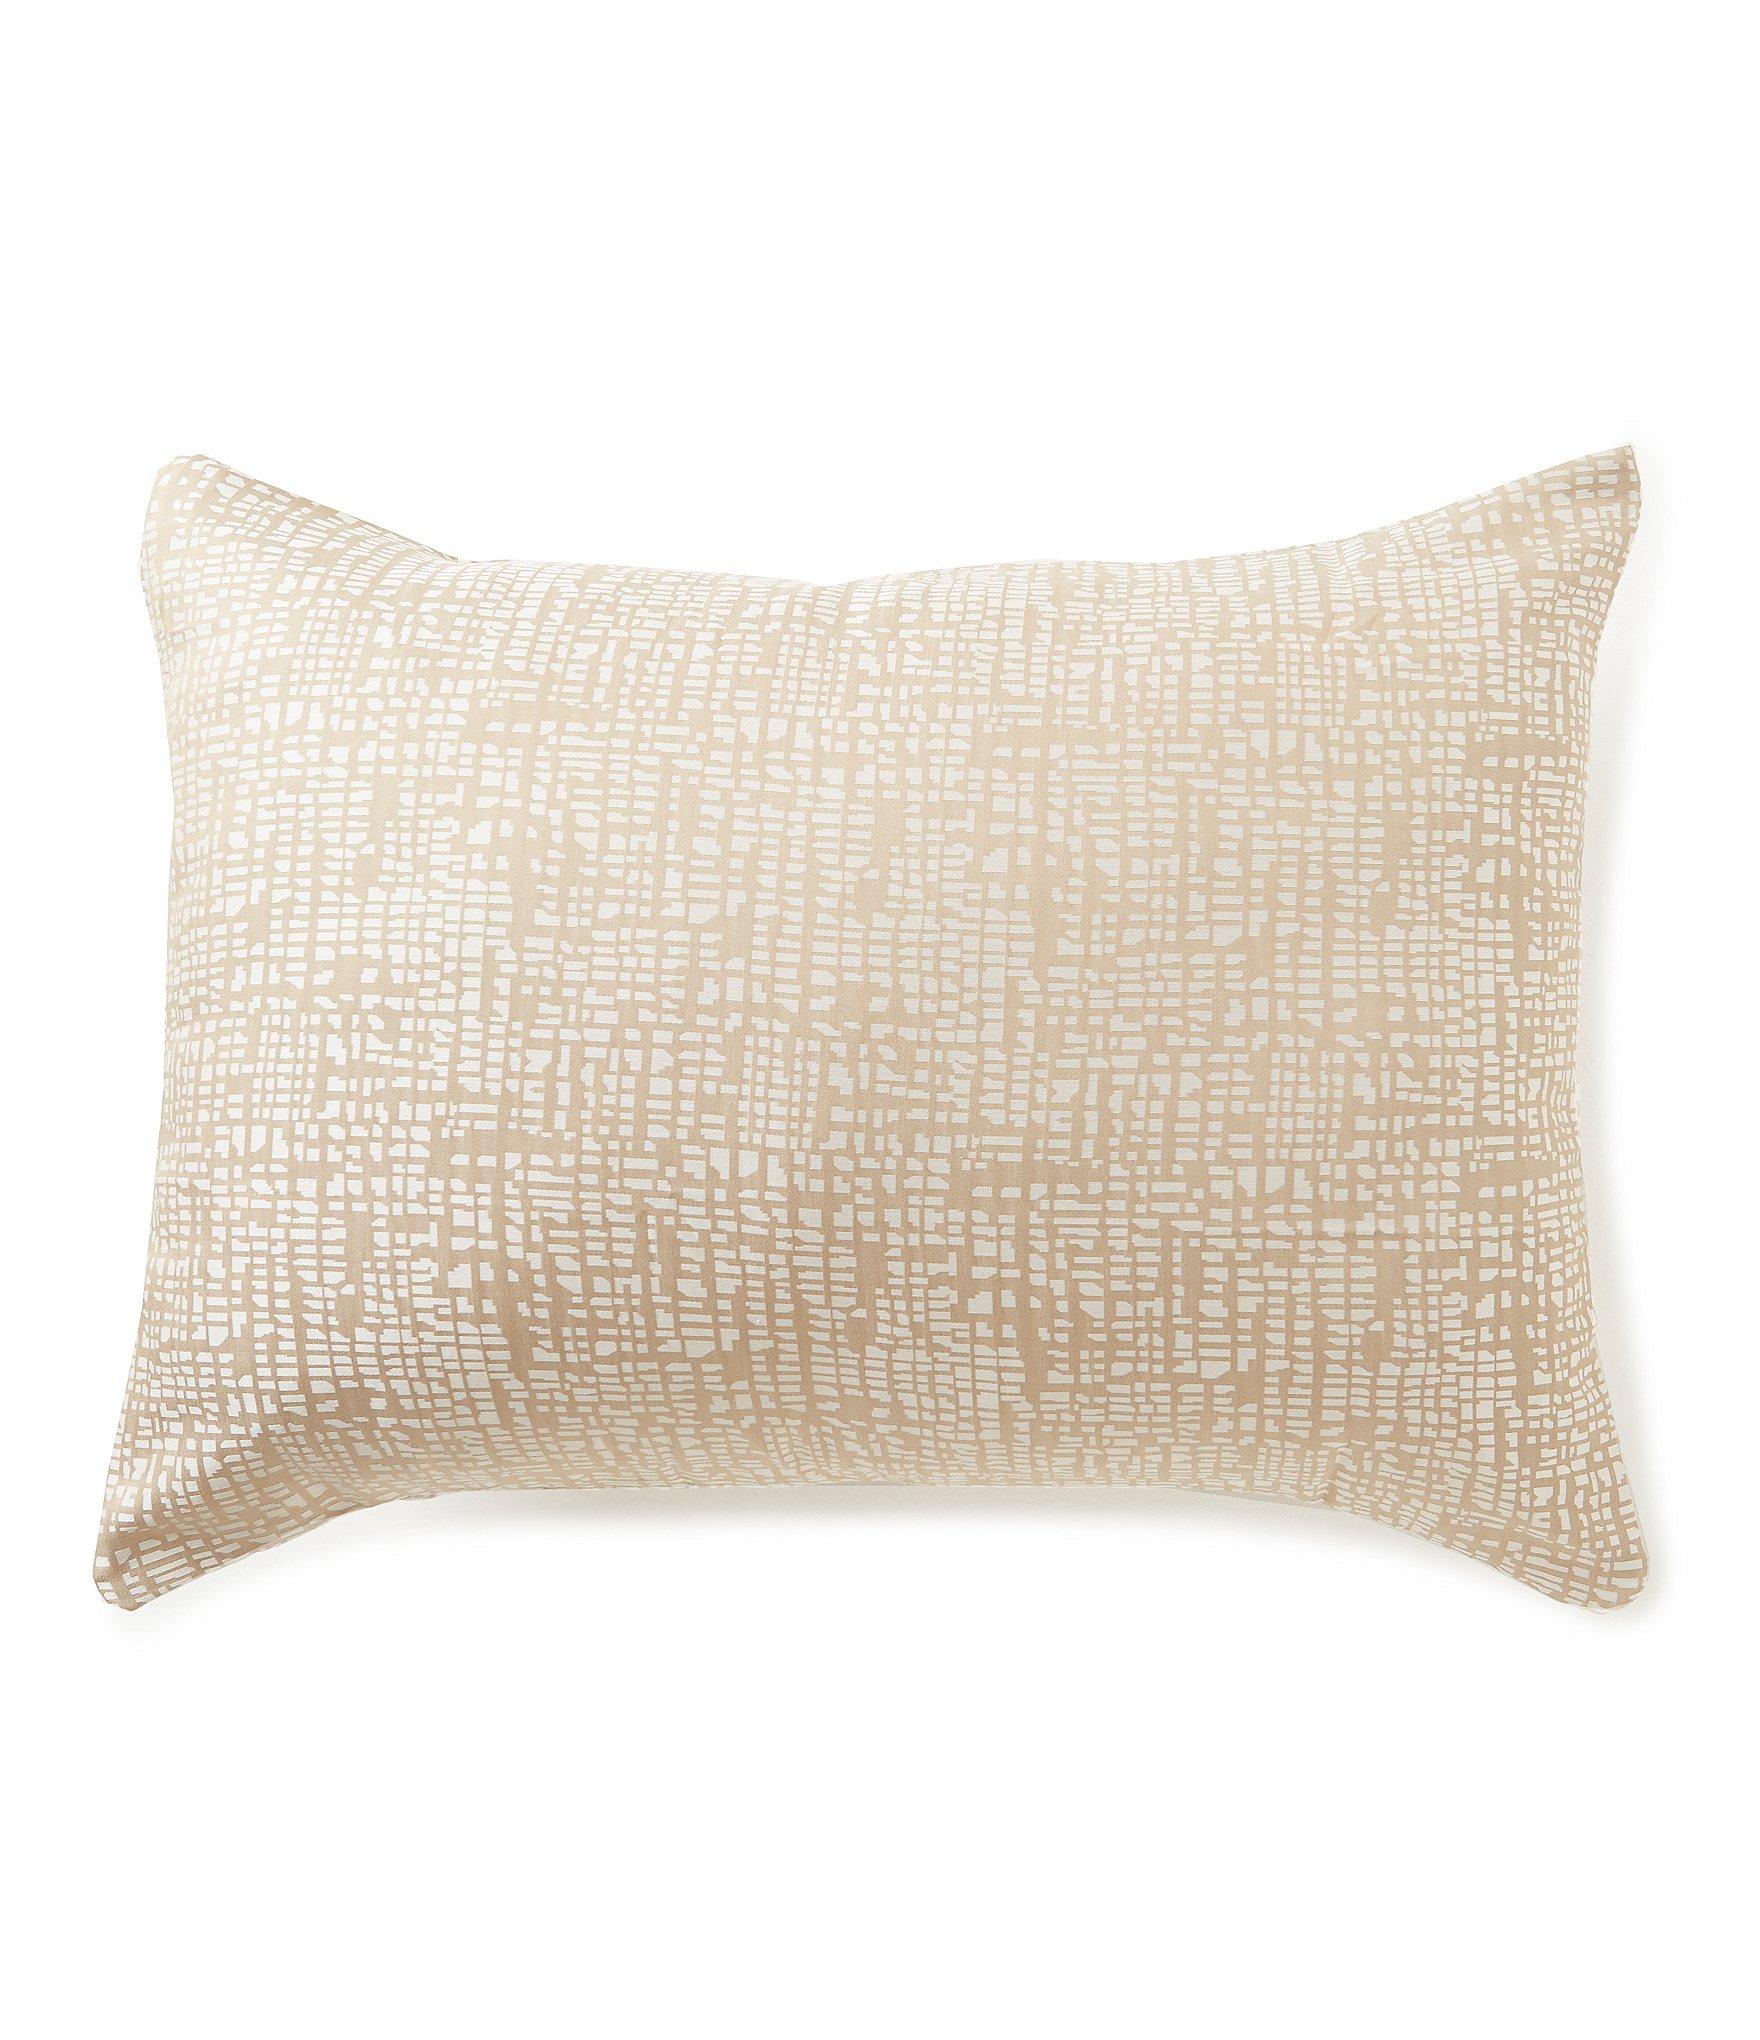 Pine Cone Hill Artisanal Collection Sketch Cotton Sateen Jacquard Sham | Dillards